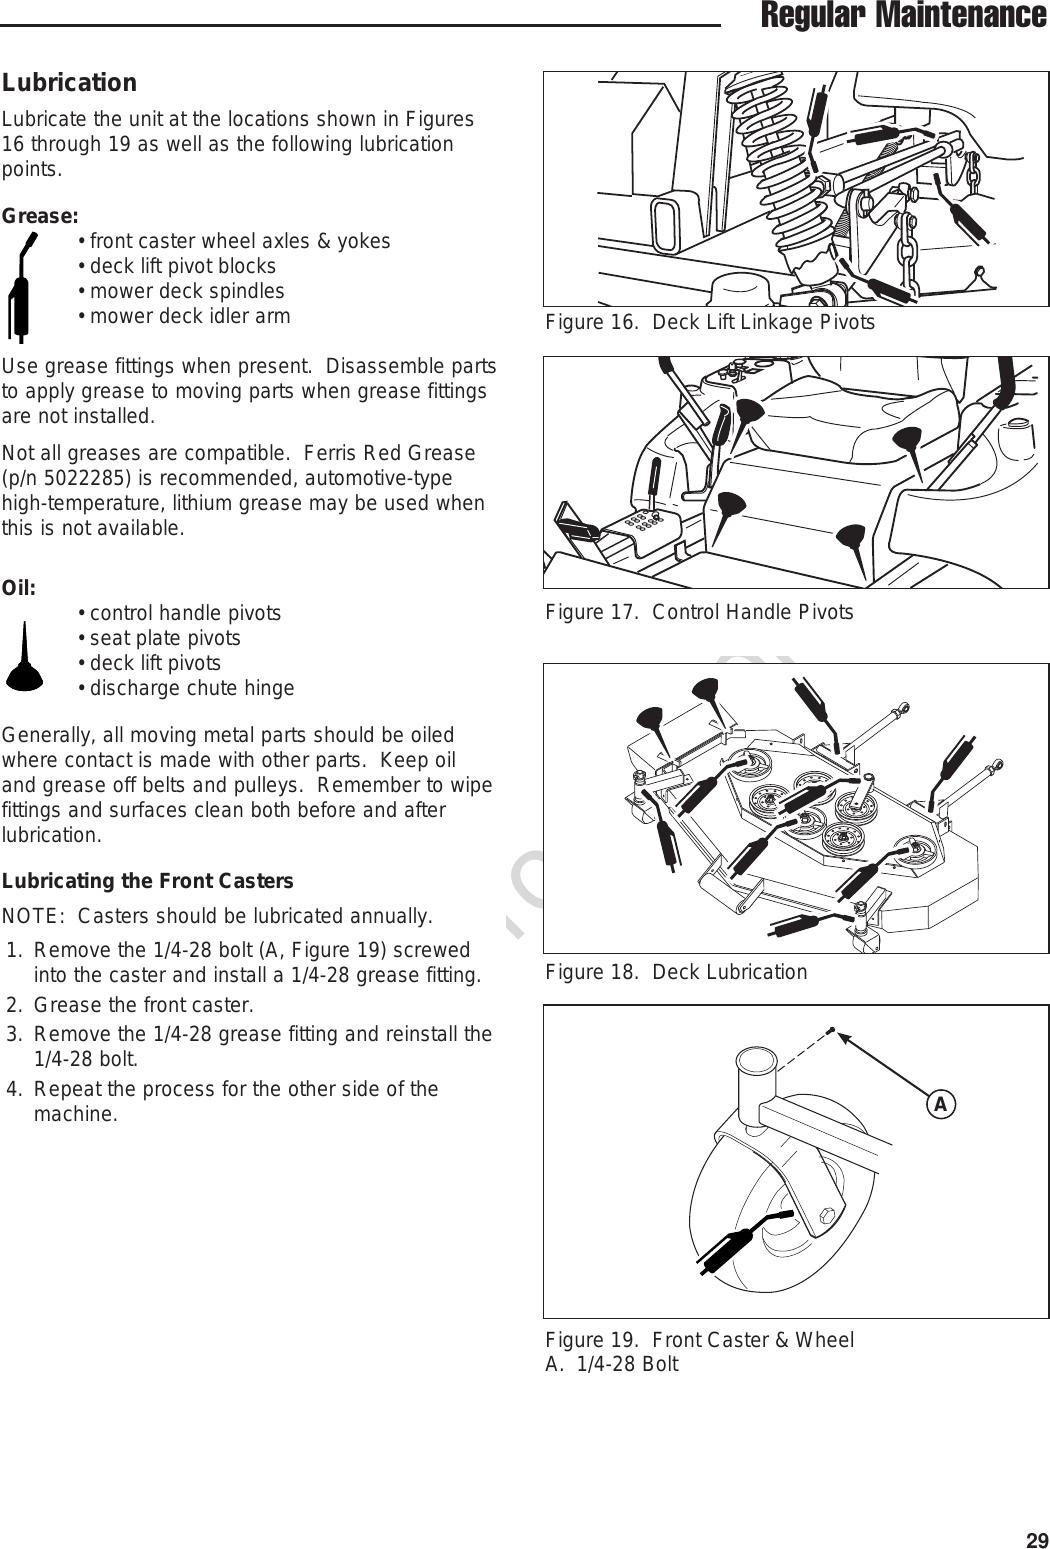 Ferris Industries Lawn Mower 5900301 Users Manual Print